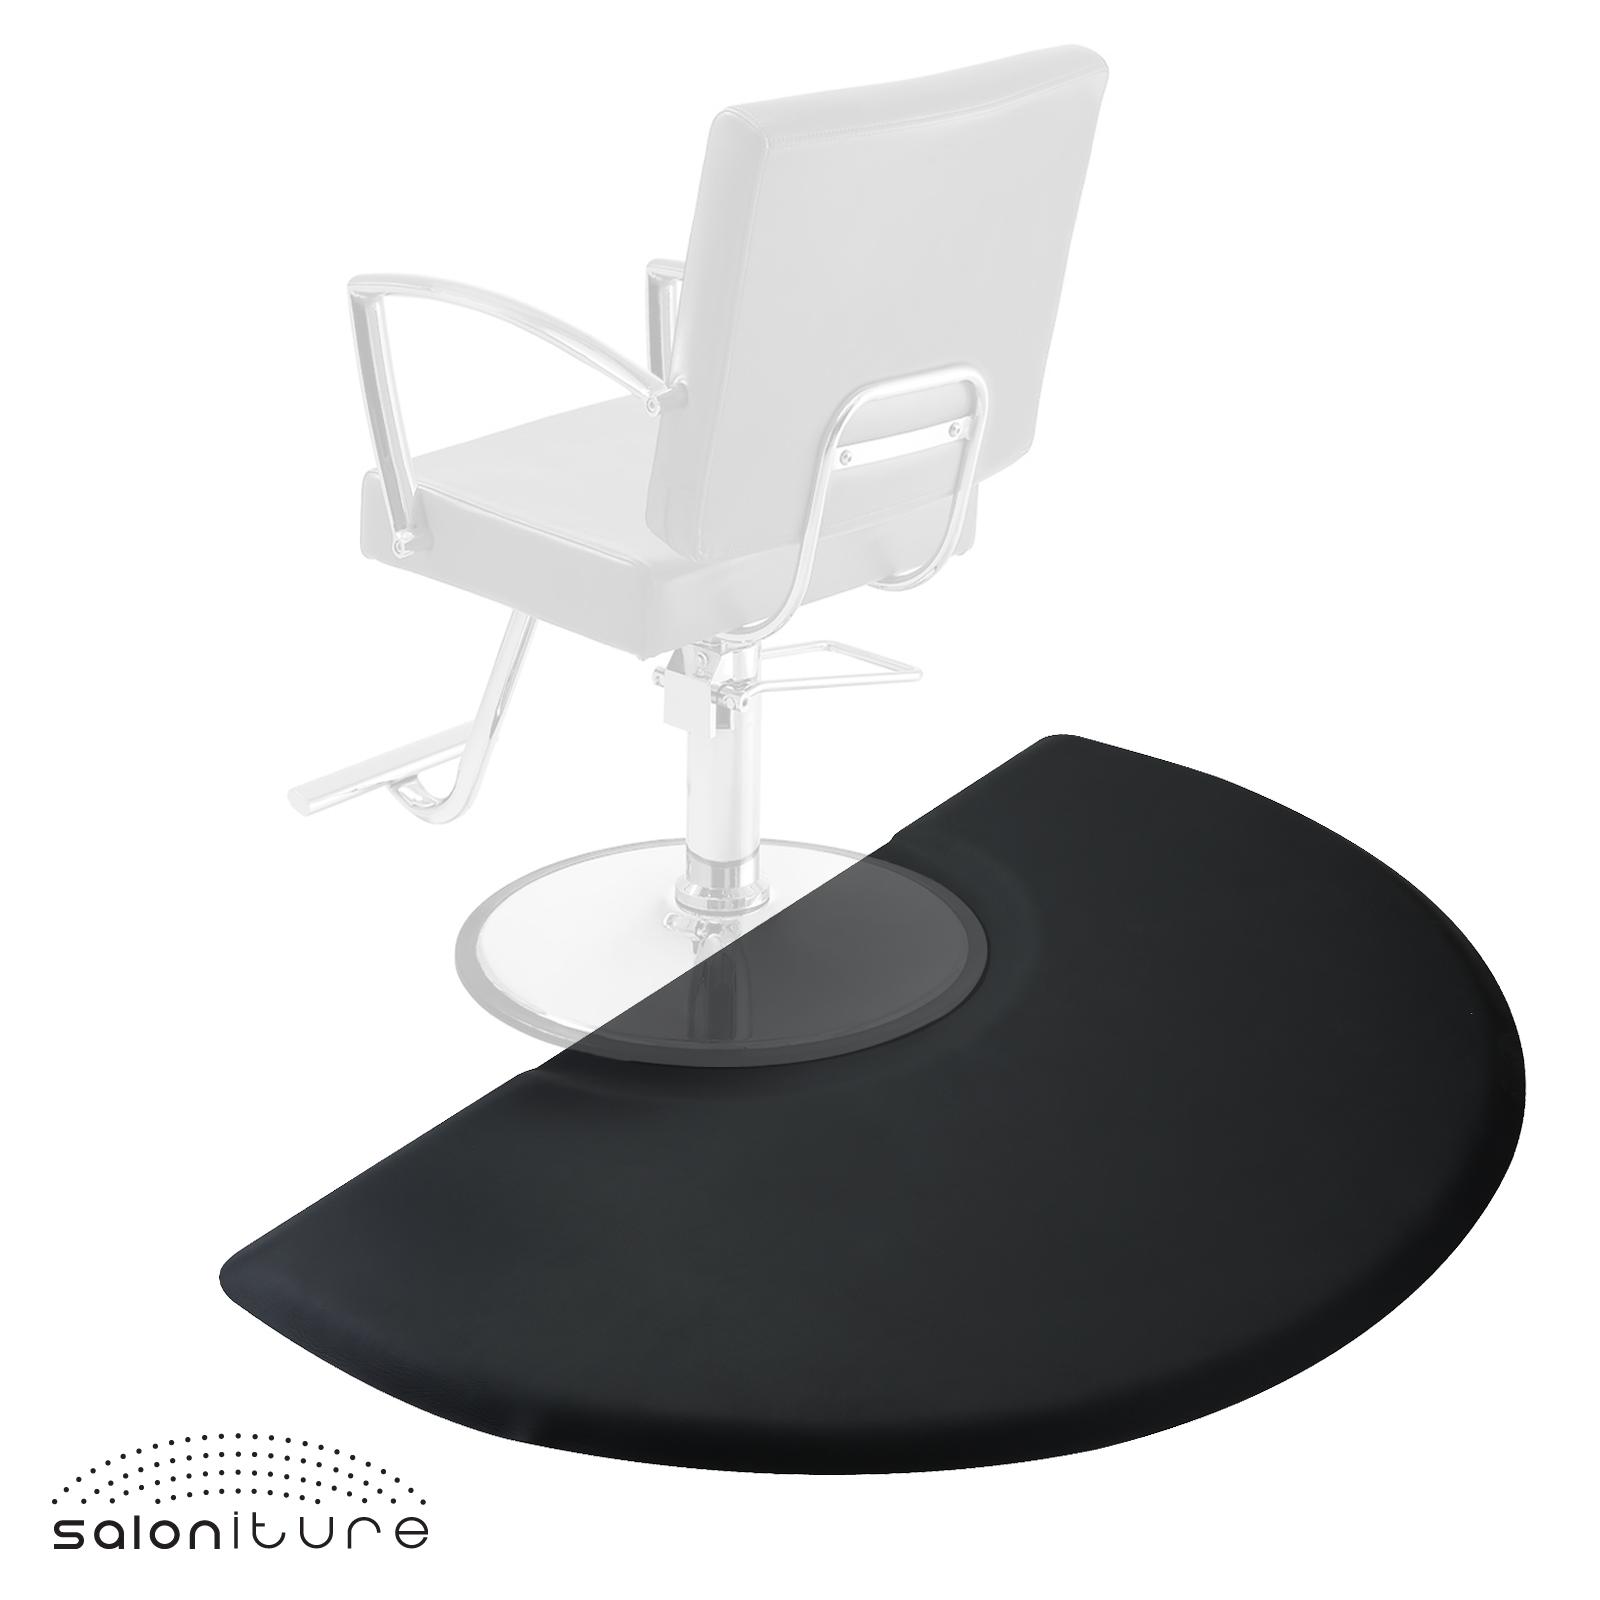 3 X 5 Salon Barber Chair Anti Fatigue Floor Mat 1 2 Quot Thick